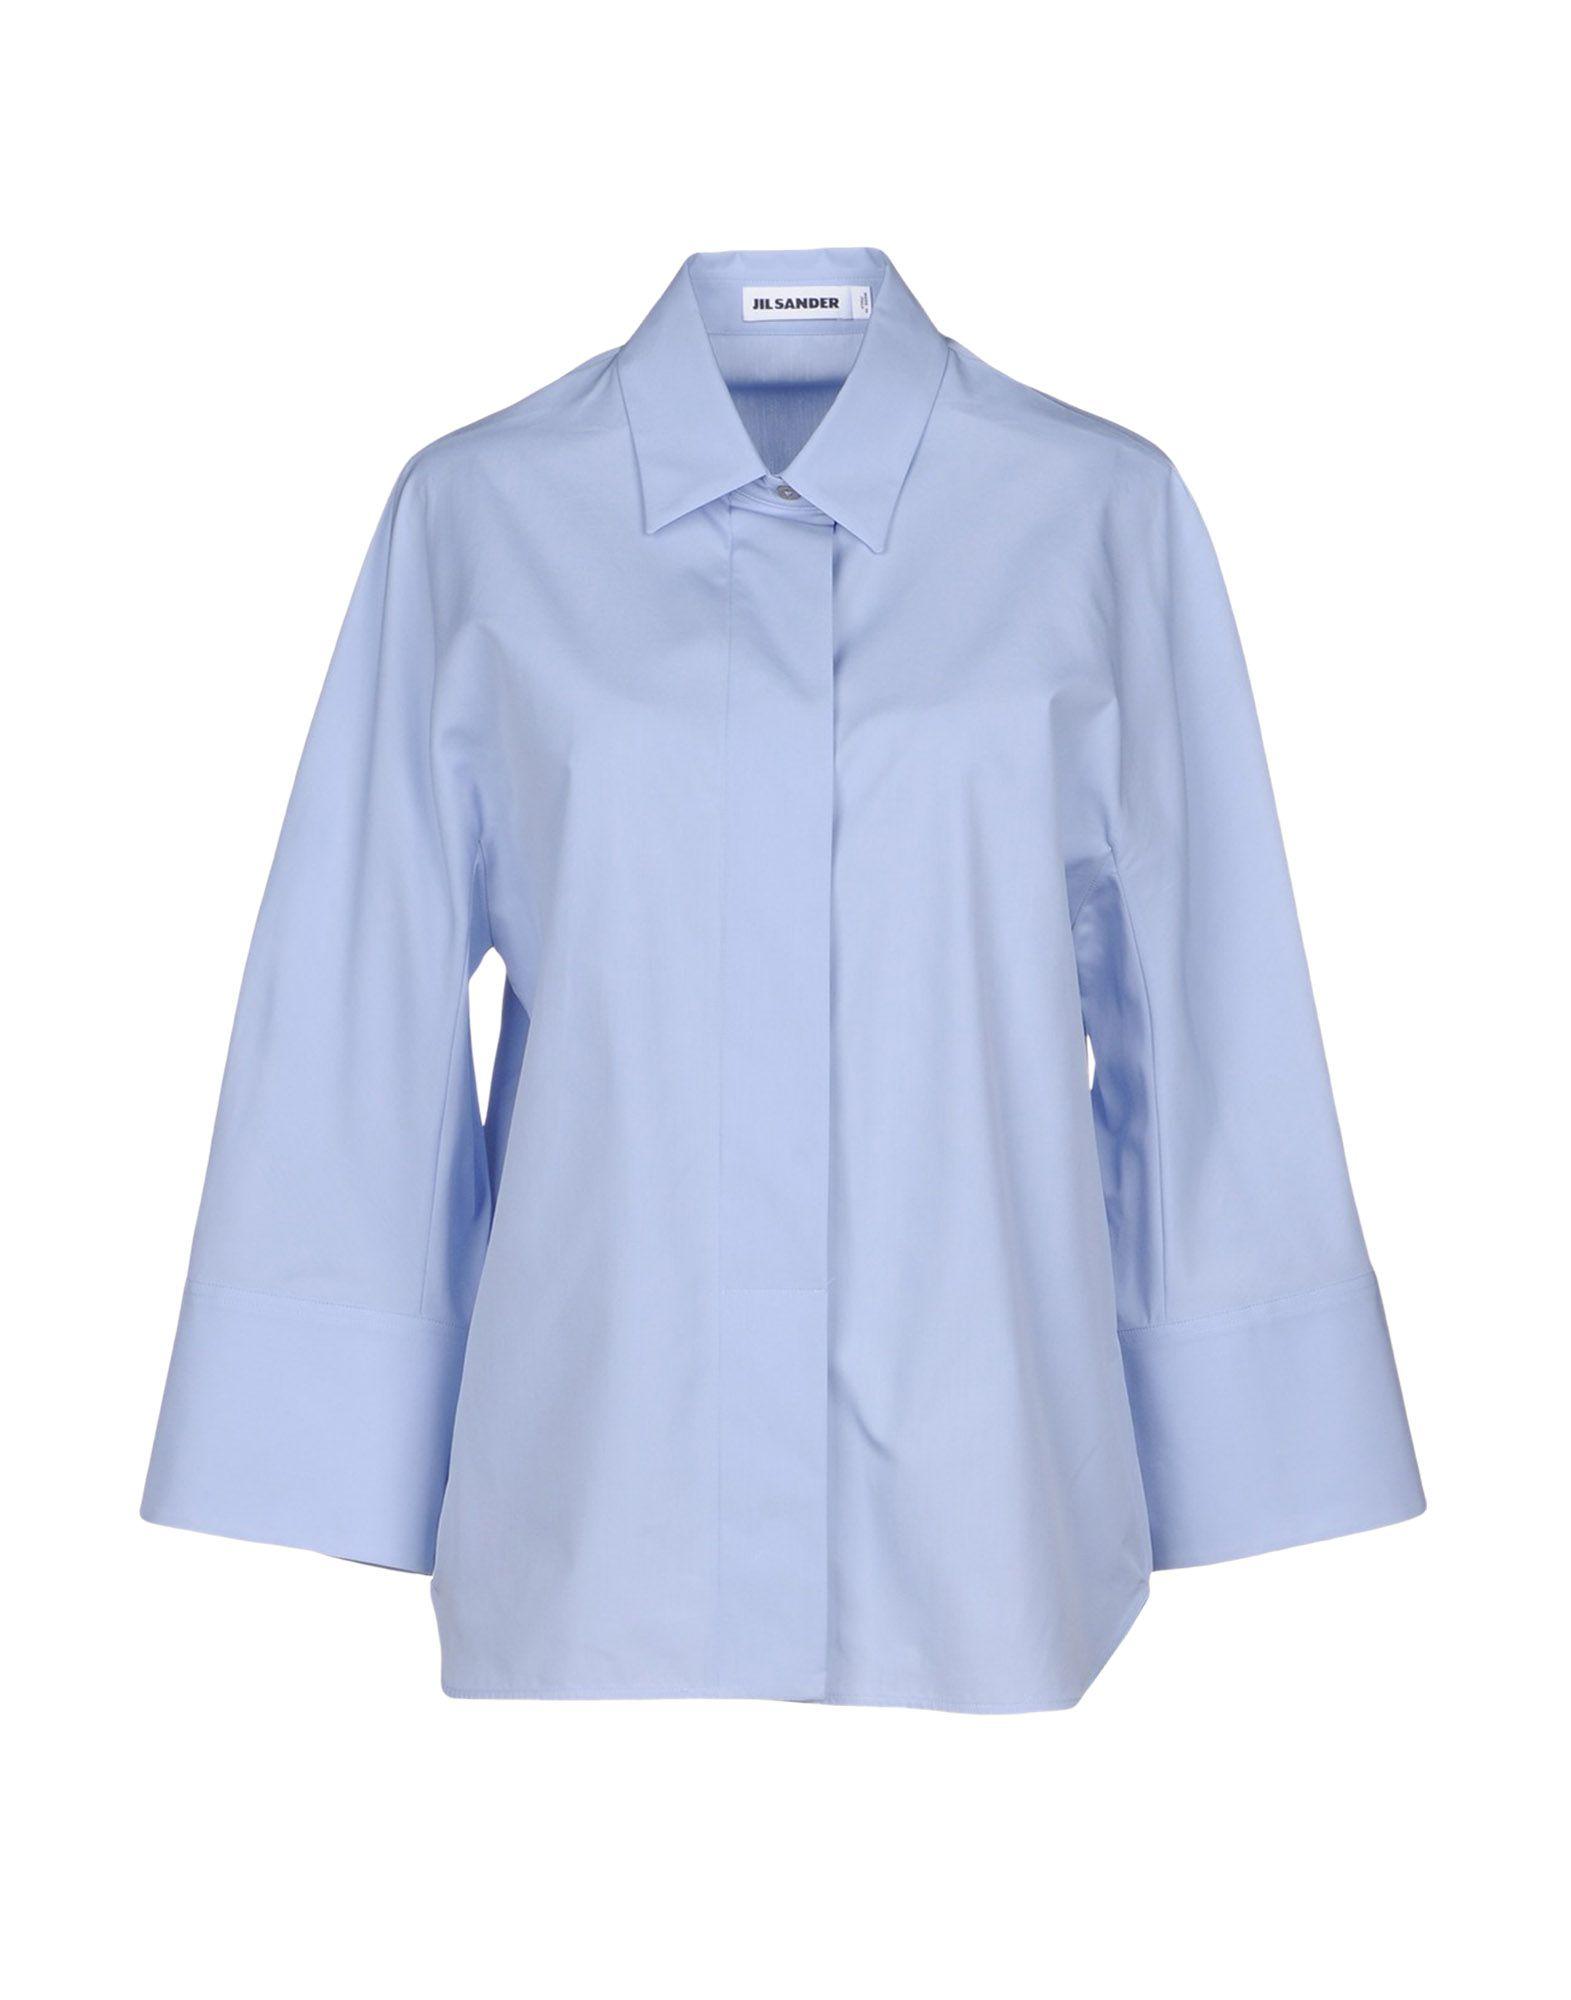 Camicie E Bluse Tinta Unita Jil Sander Donna - Acquista online su 3MgBlHp